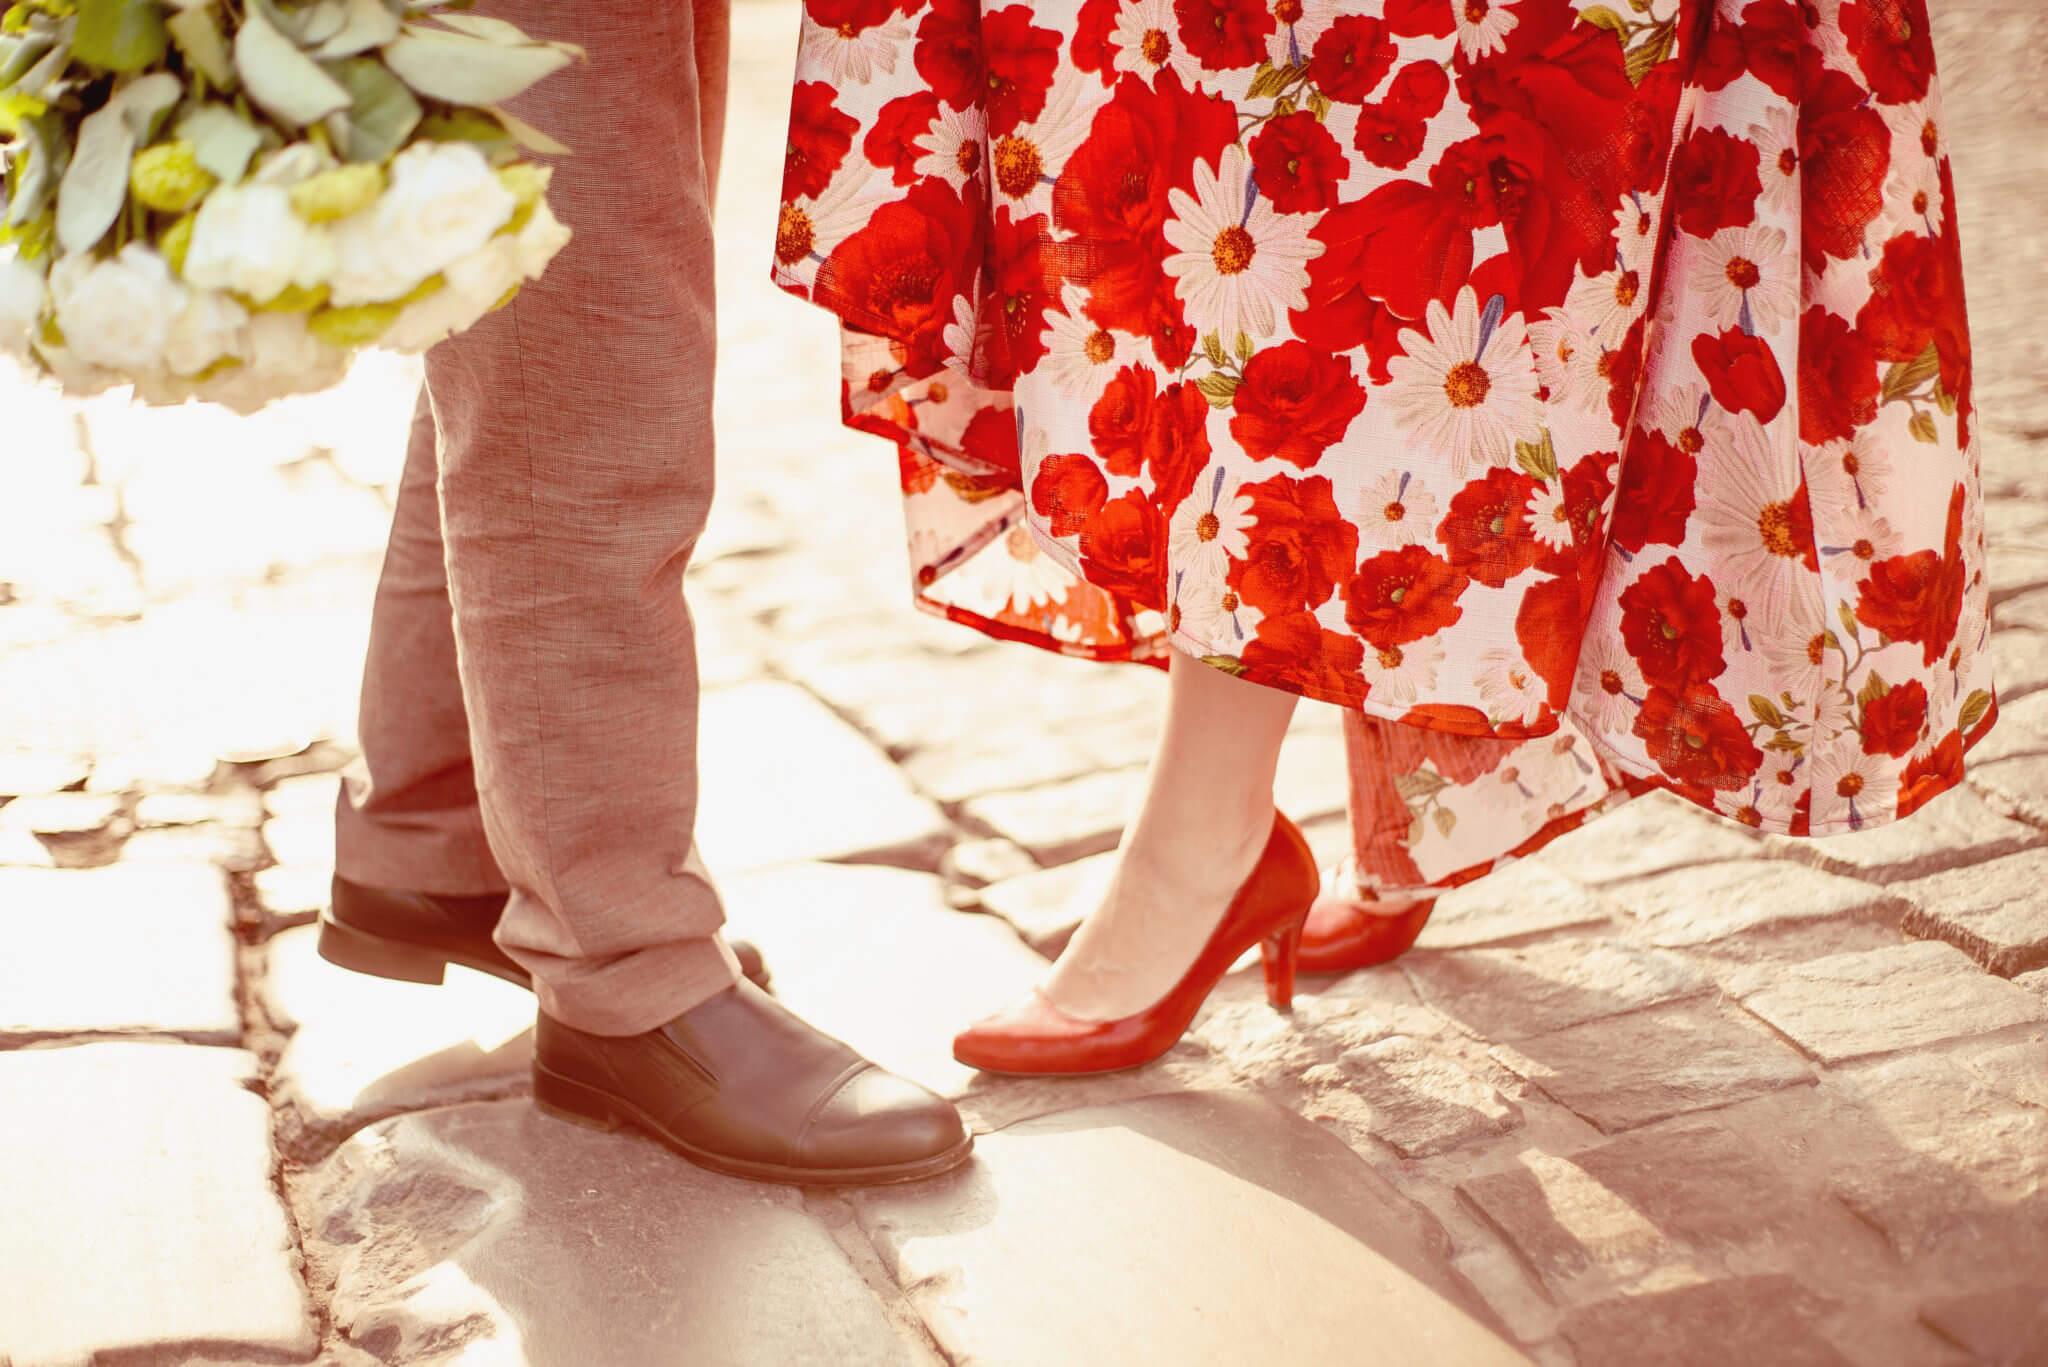 Love story фотосессия на природе, прогулка по городу, Воздвиженка, закат, в кадре мужские и женские ноги на брусчатке, ph Постникова Алиса